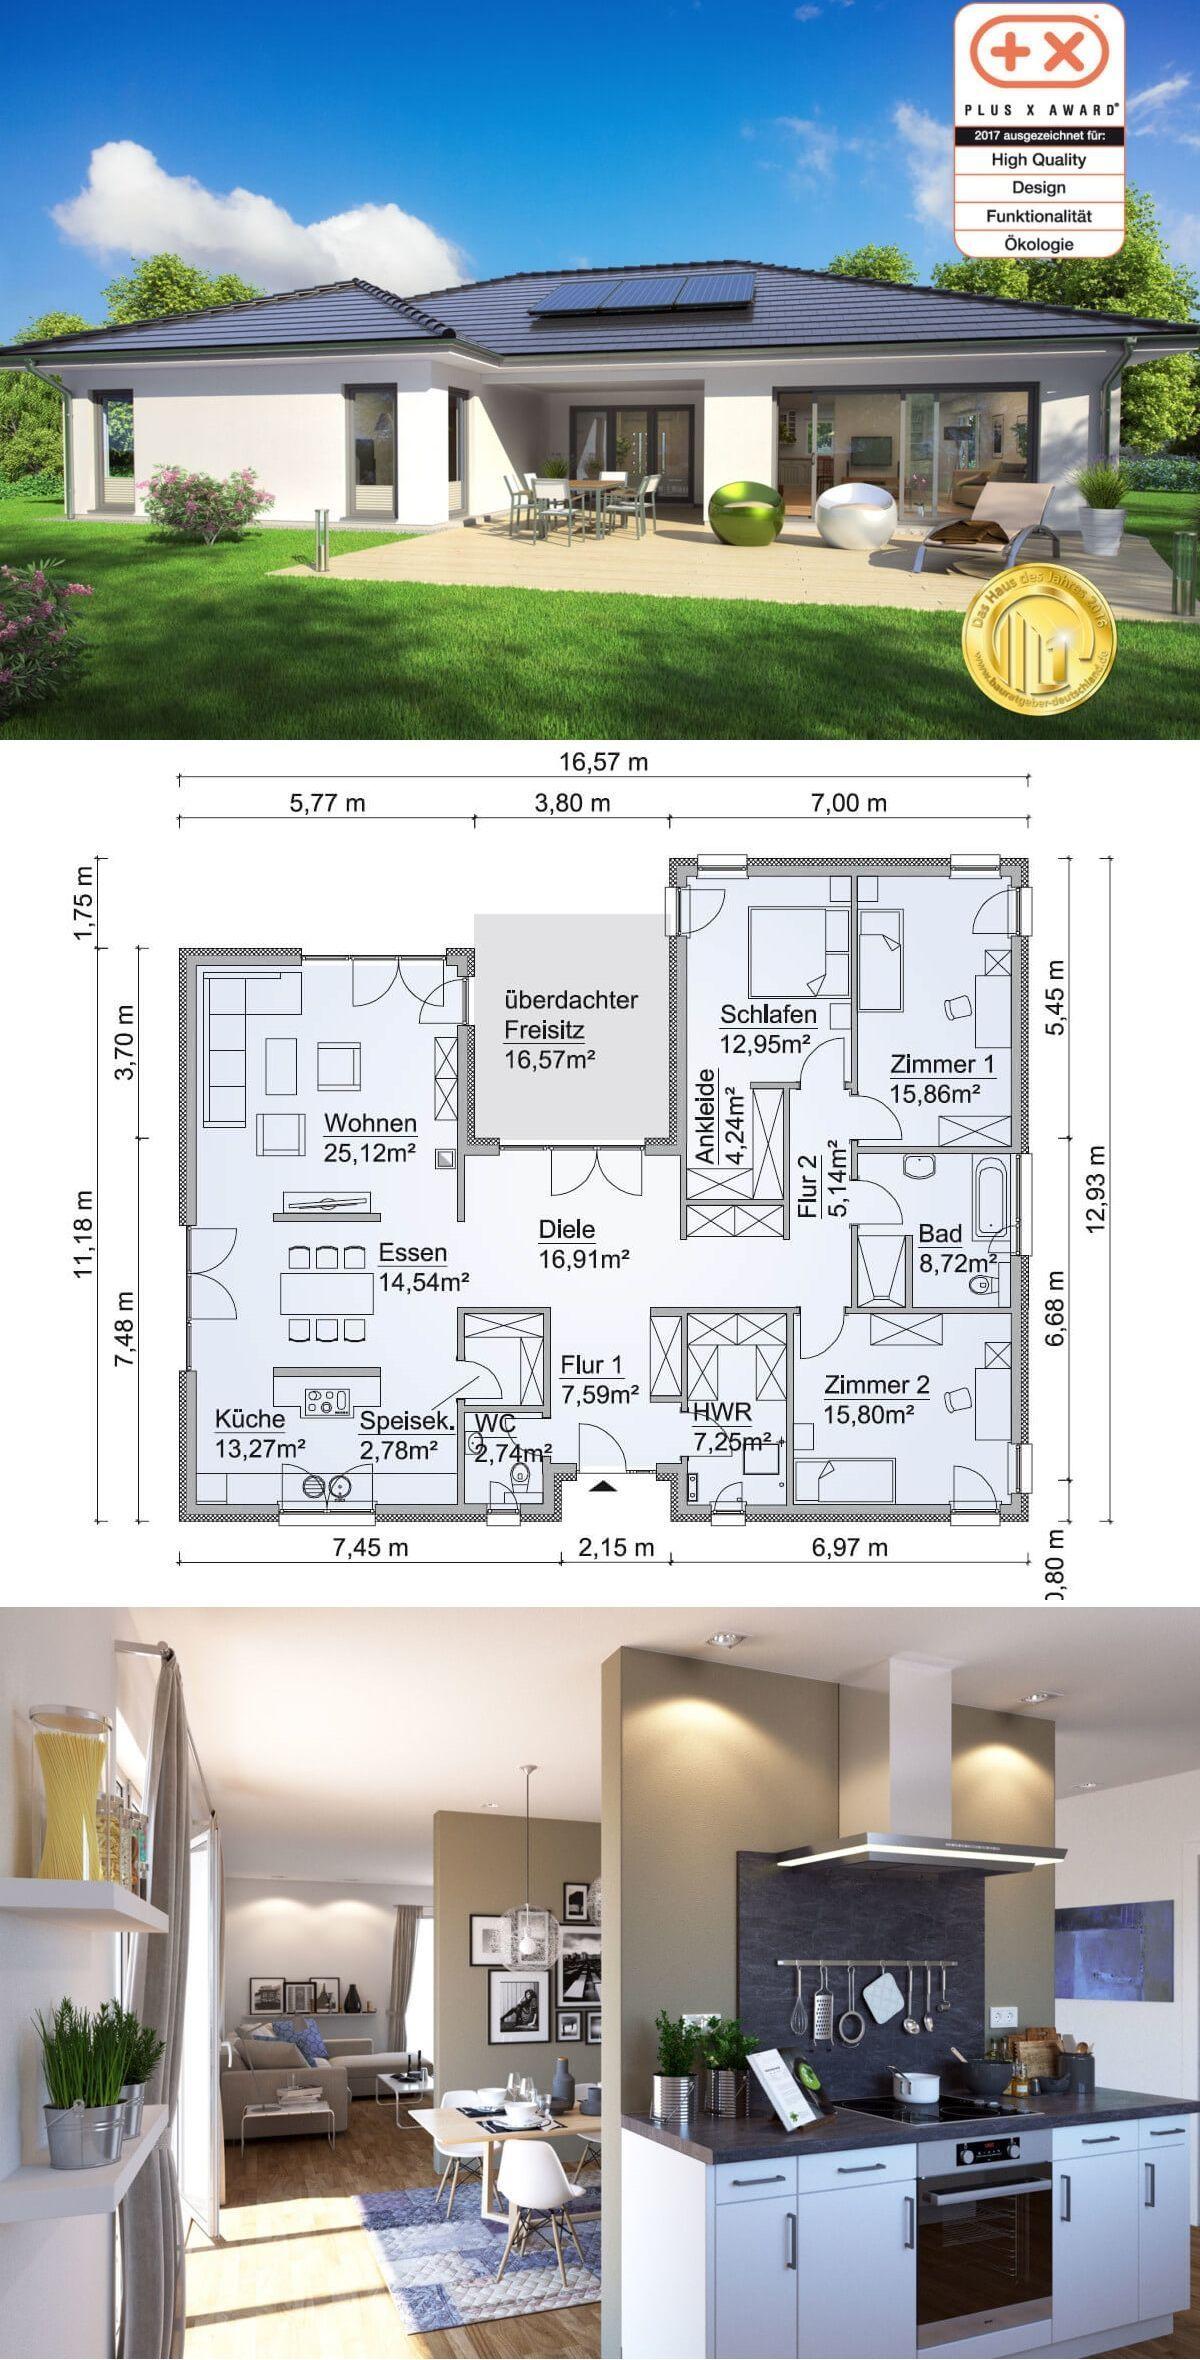 Bungalow Sh 169 Wb Walmdach Scanhaus Marlow Hausbaudirekt De In 2020 Bungalow House Plans House Plans Farmhouse House Layout Plans